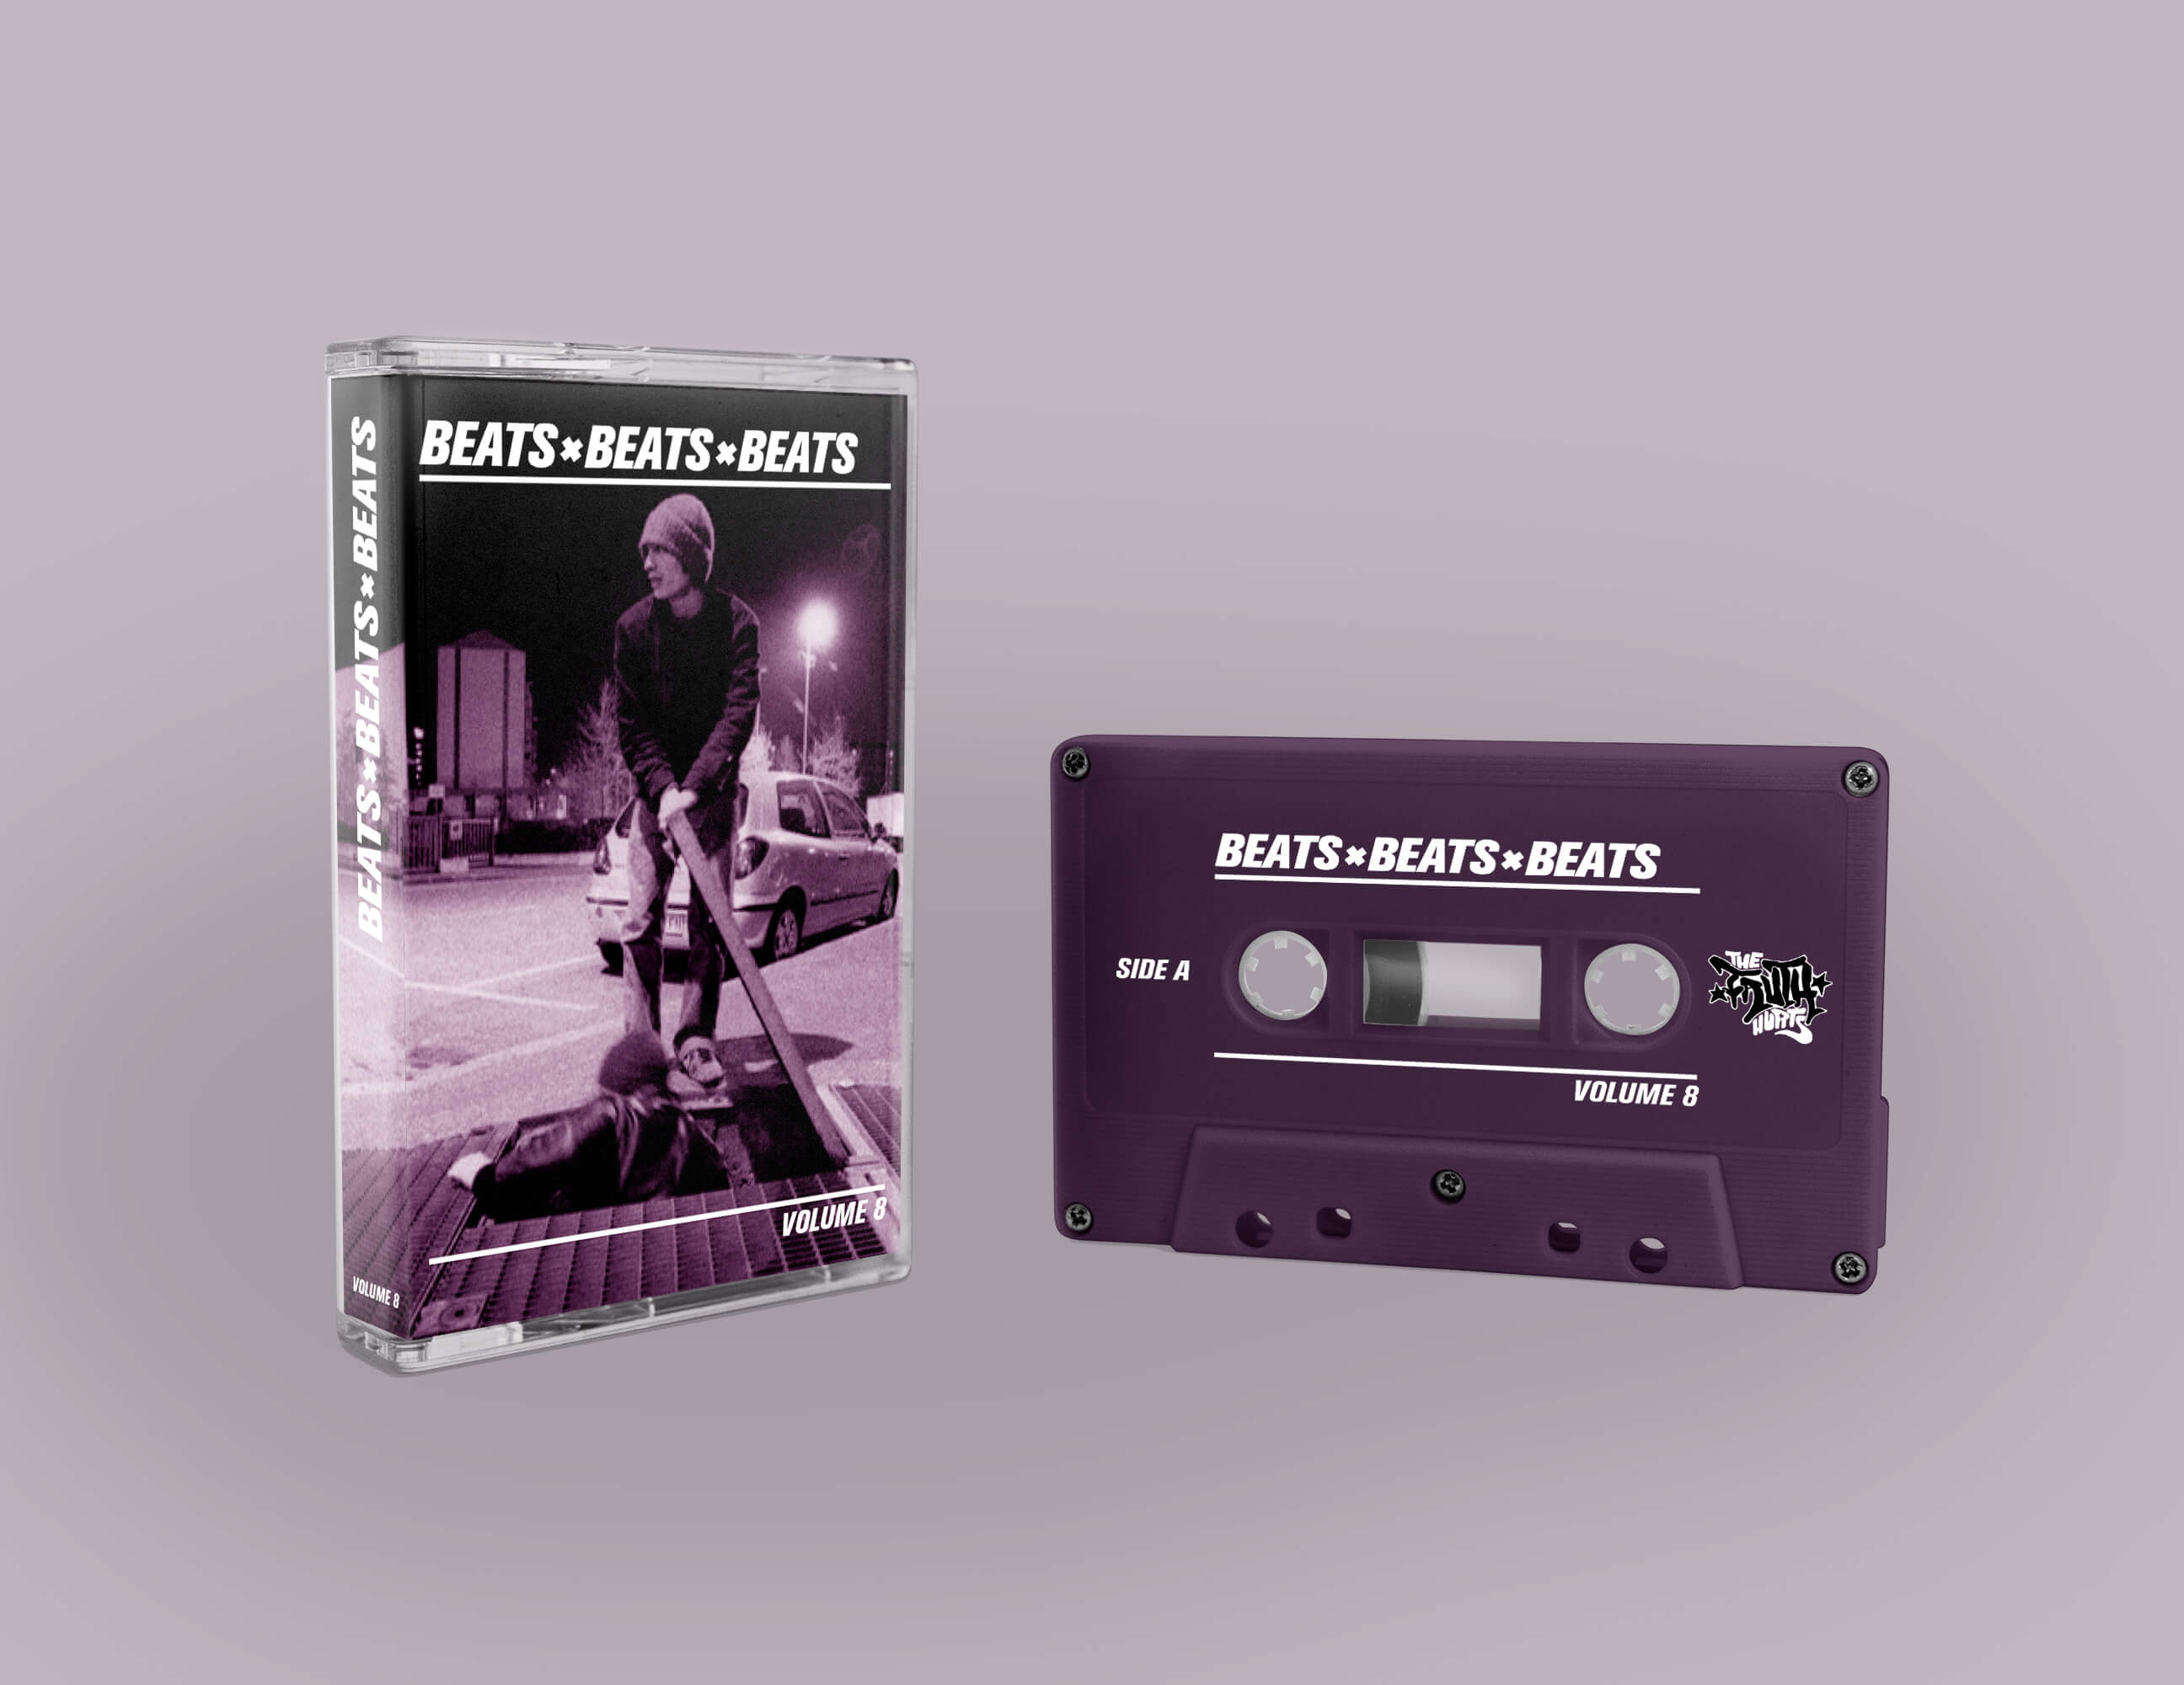 beats x beats x beats casette